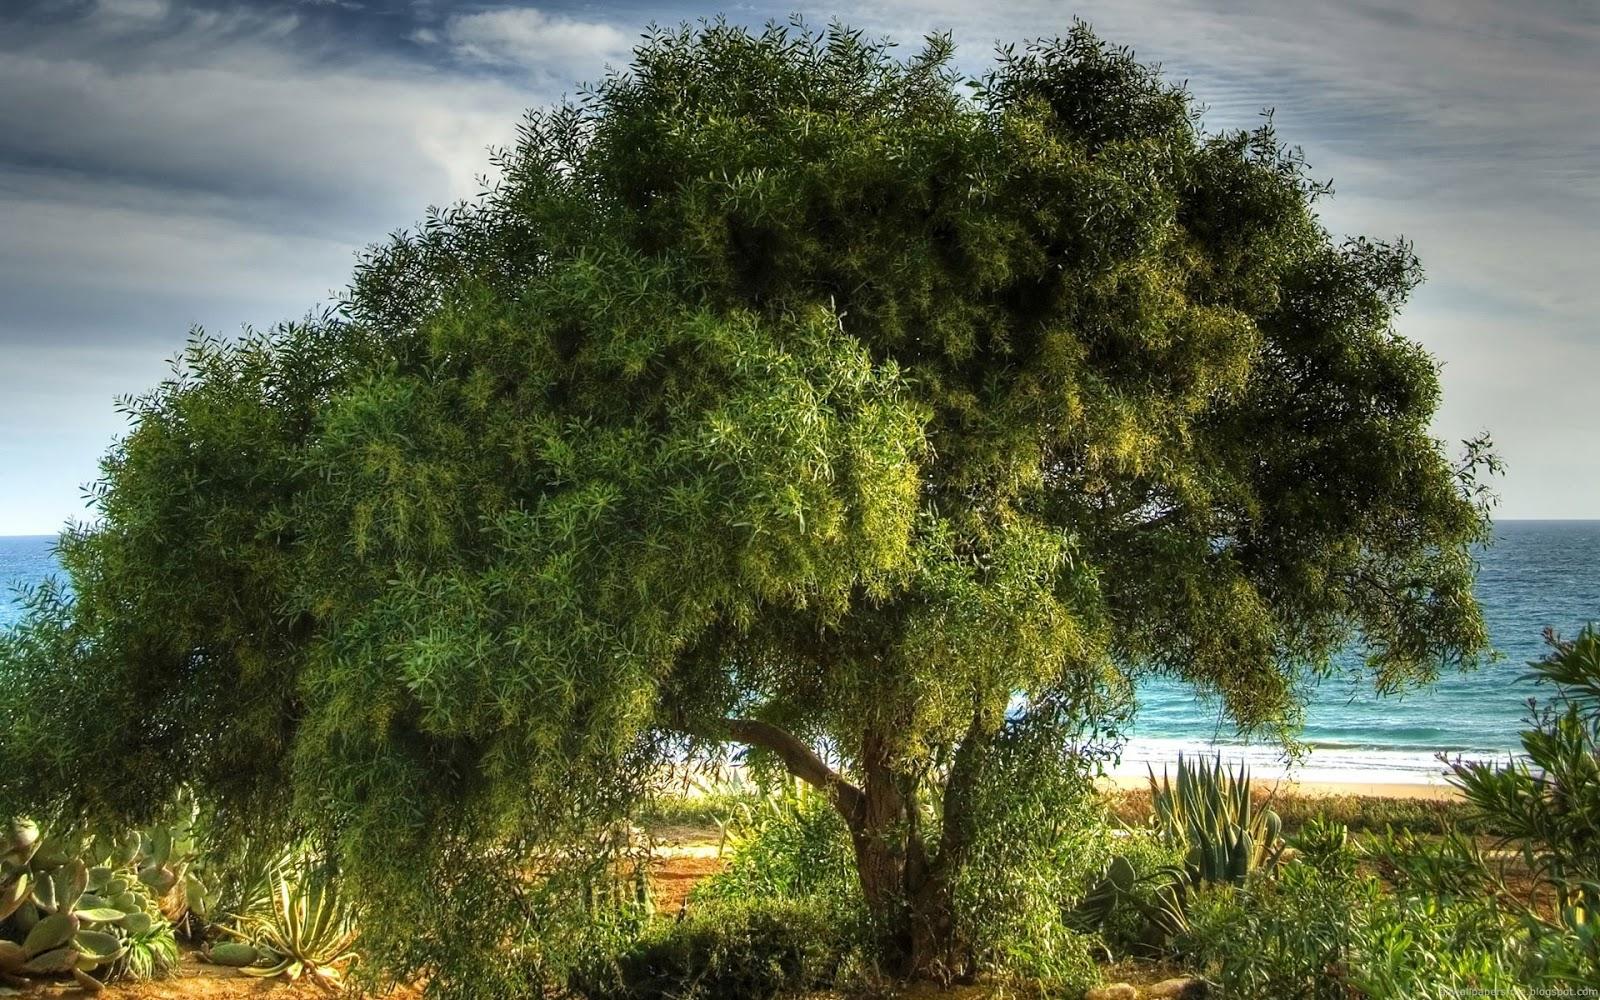 HD Wallpapers Desktop Big Trees HD Wallpapers 1600x1000